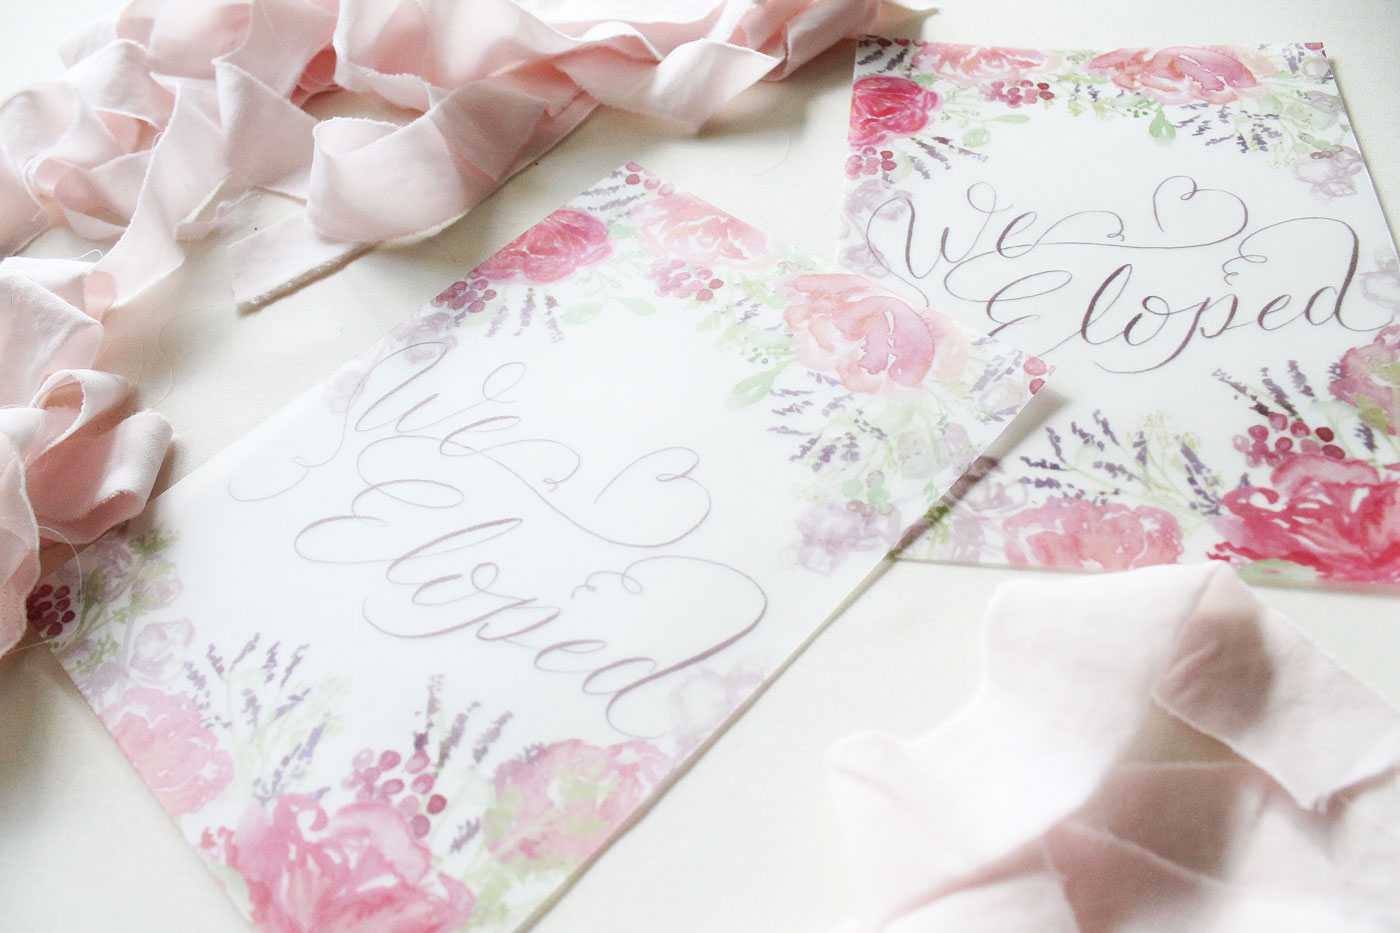 we eloped, vellum printed wedding elopement announcement, custom design from Blush and Blue Designs